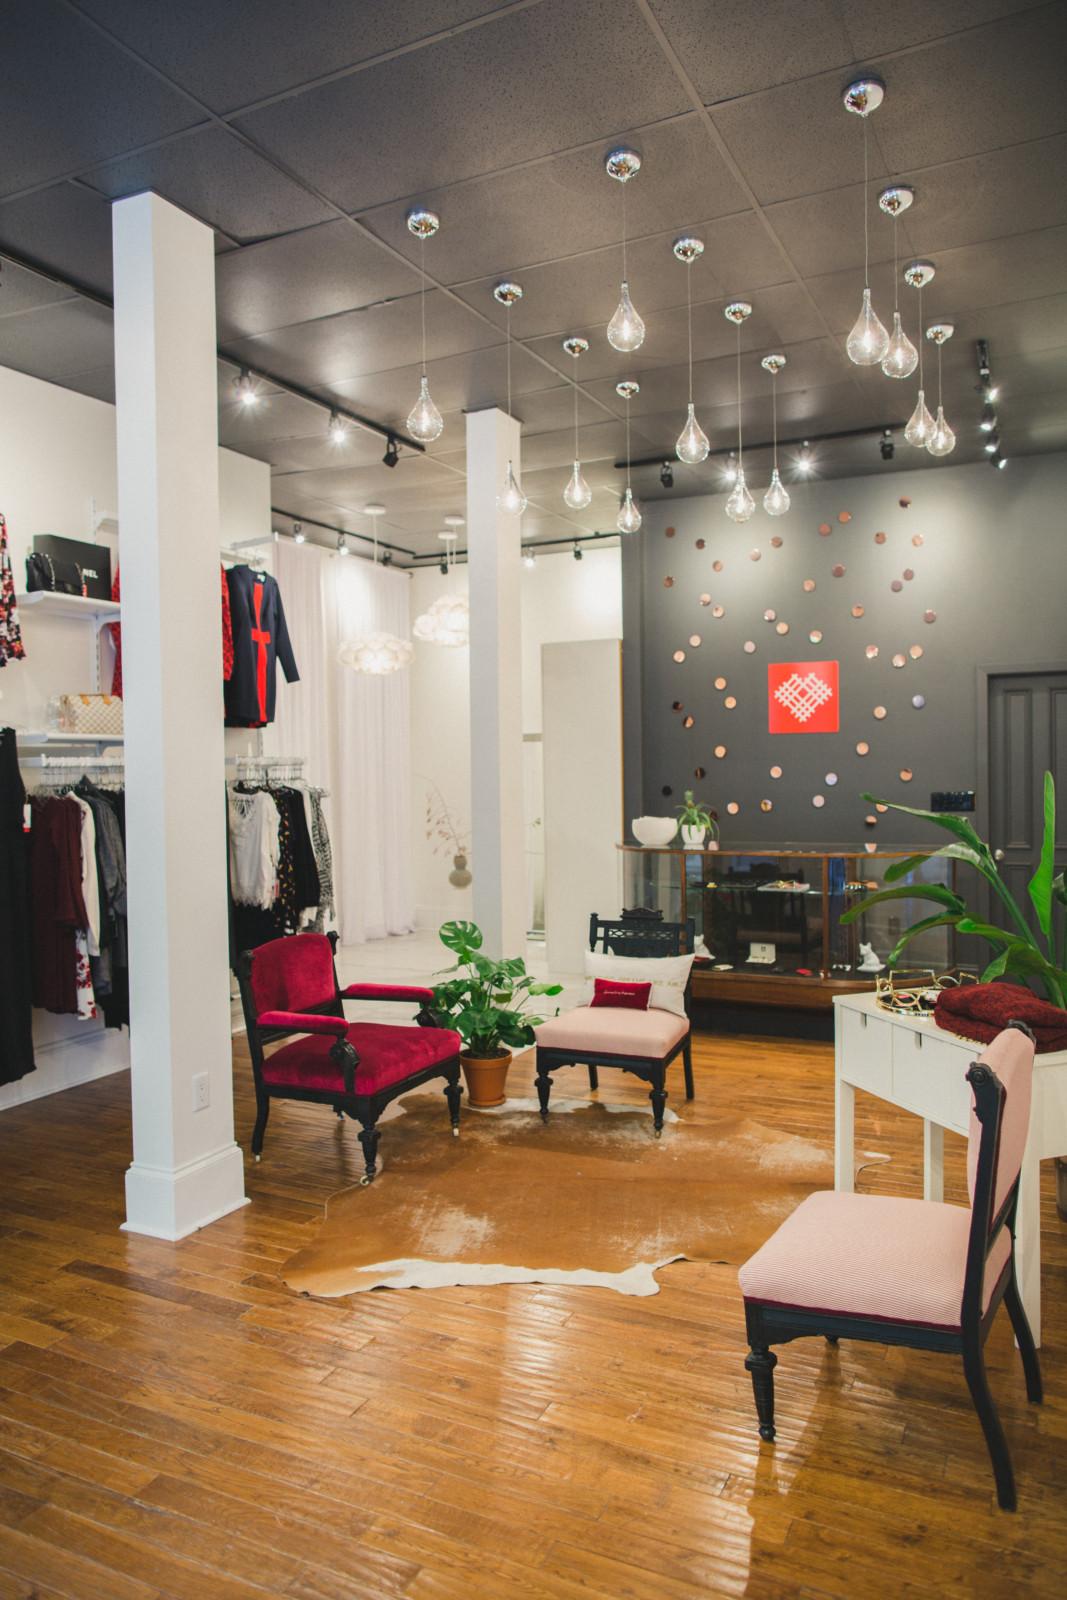 van briggle lorelei vase of uptown girl fashion boutique dartmouth with regard to ella the shop 9